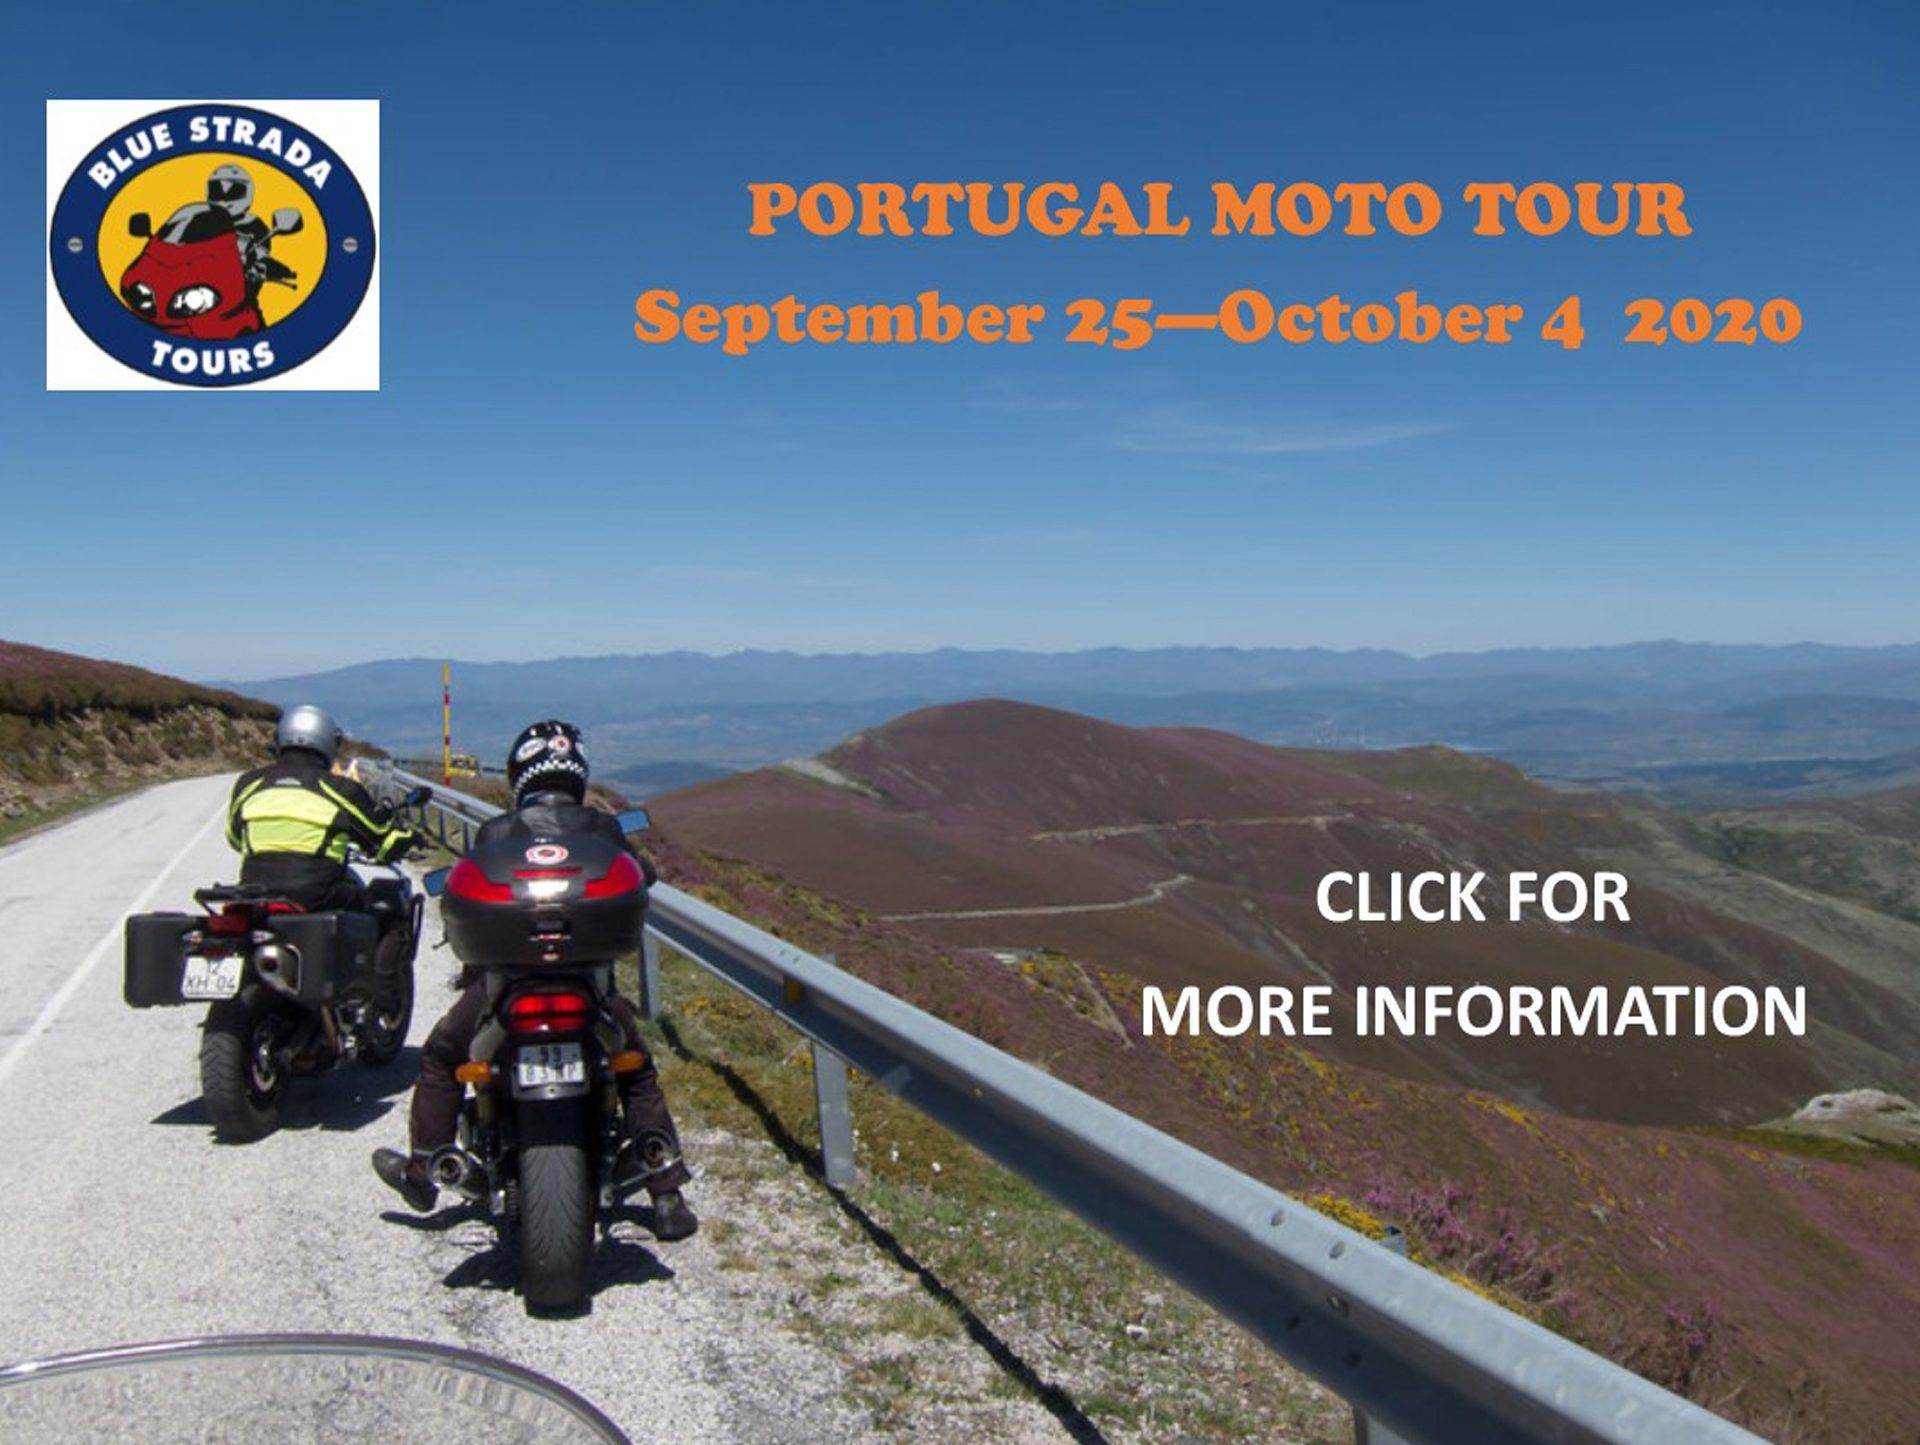 https://bluestradatours.com/wp-content/uploads/2020/03/Porto-2020-Tour-flyer.-final.11.18-bk.pdf